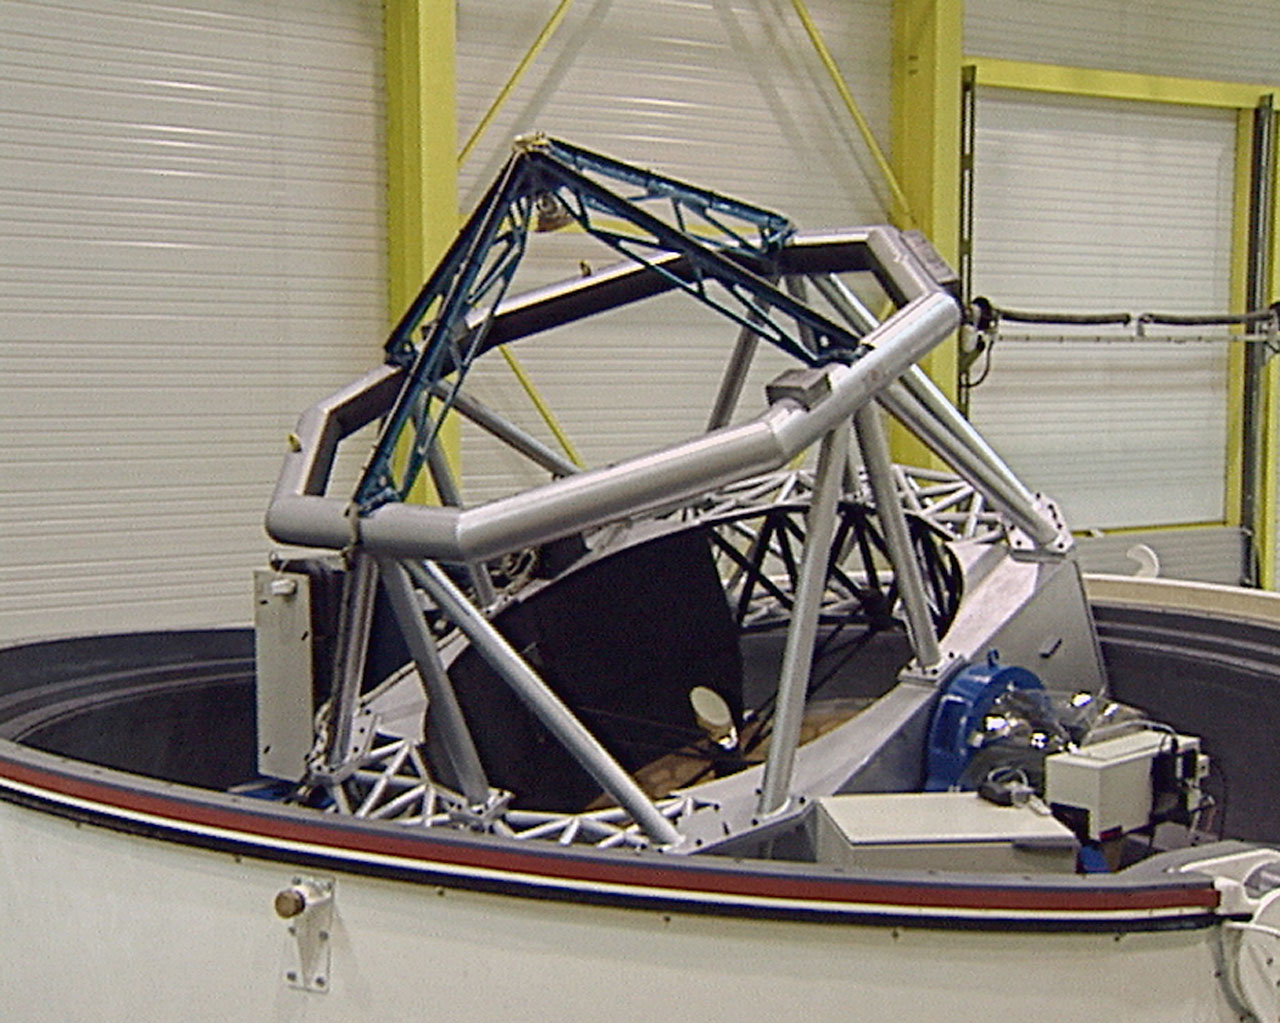 The 1.8-m AT1 at the AMOS factory